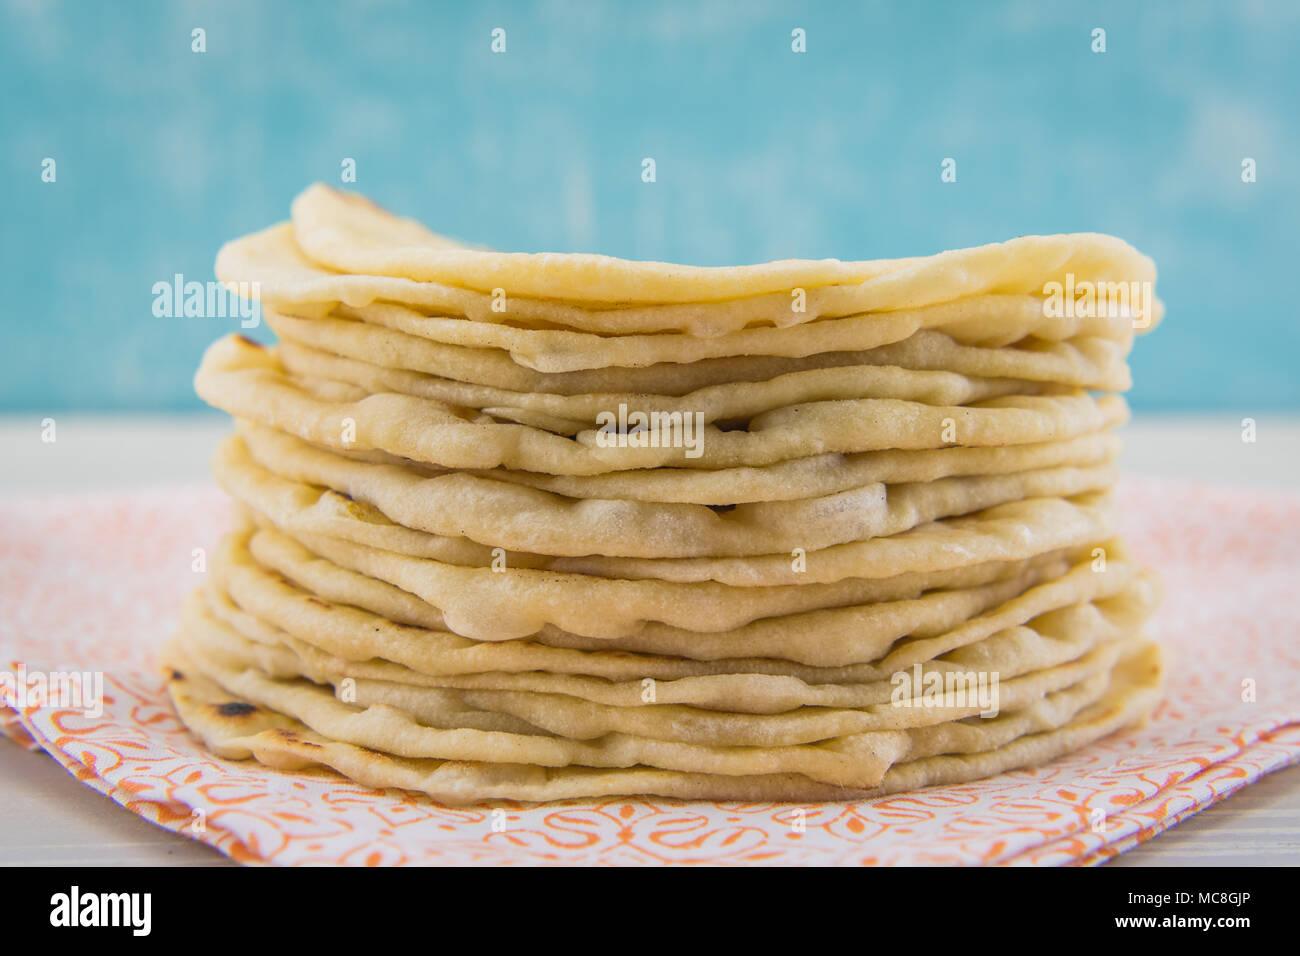 Stack of Fresh Floud Tortillas on Orange Cloth - Stock Image